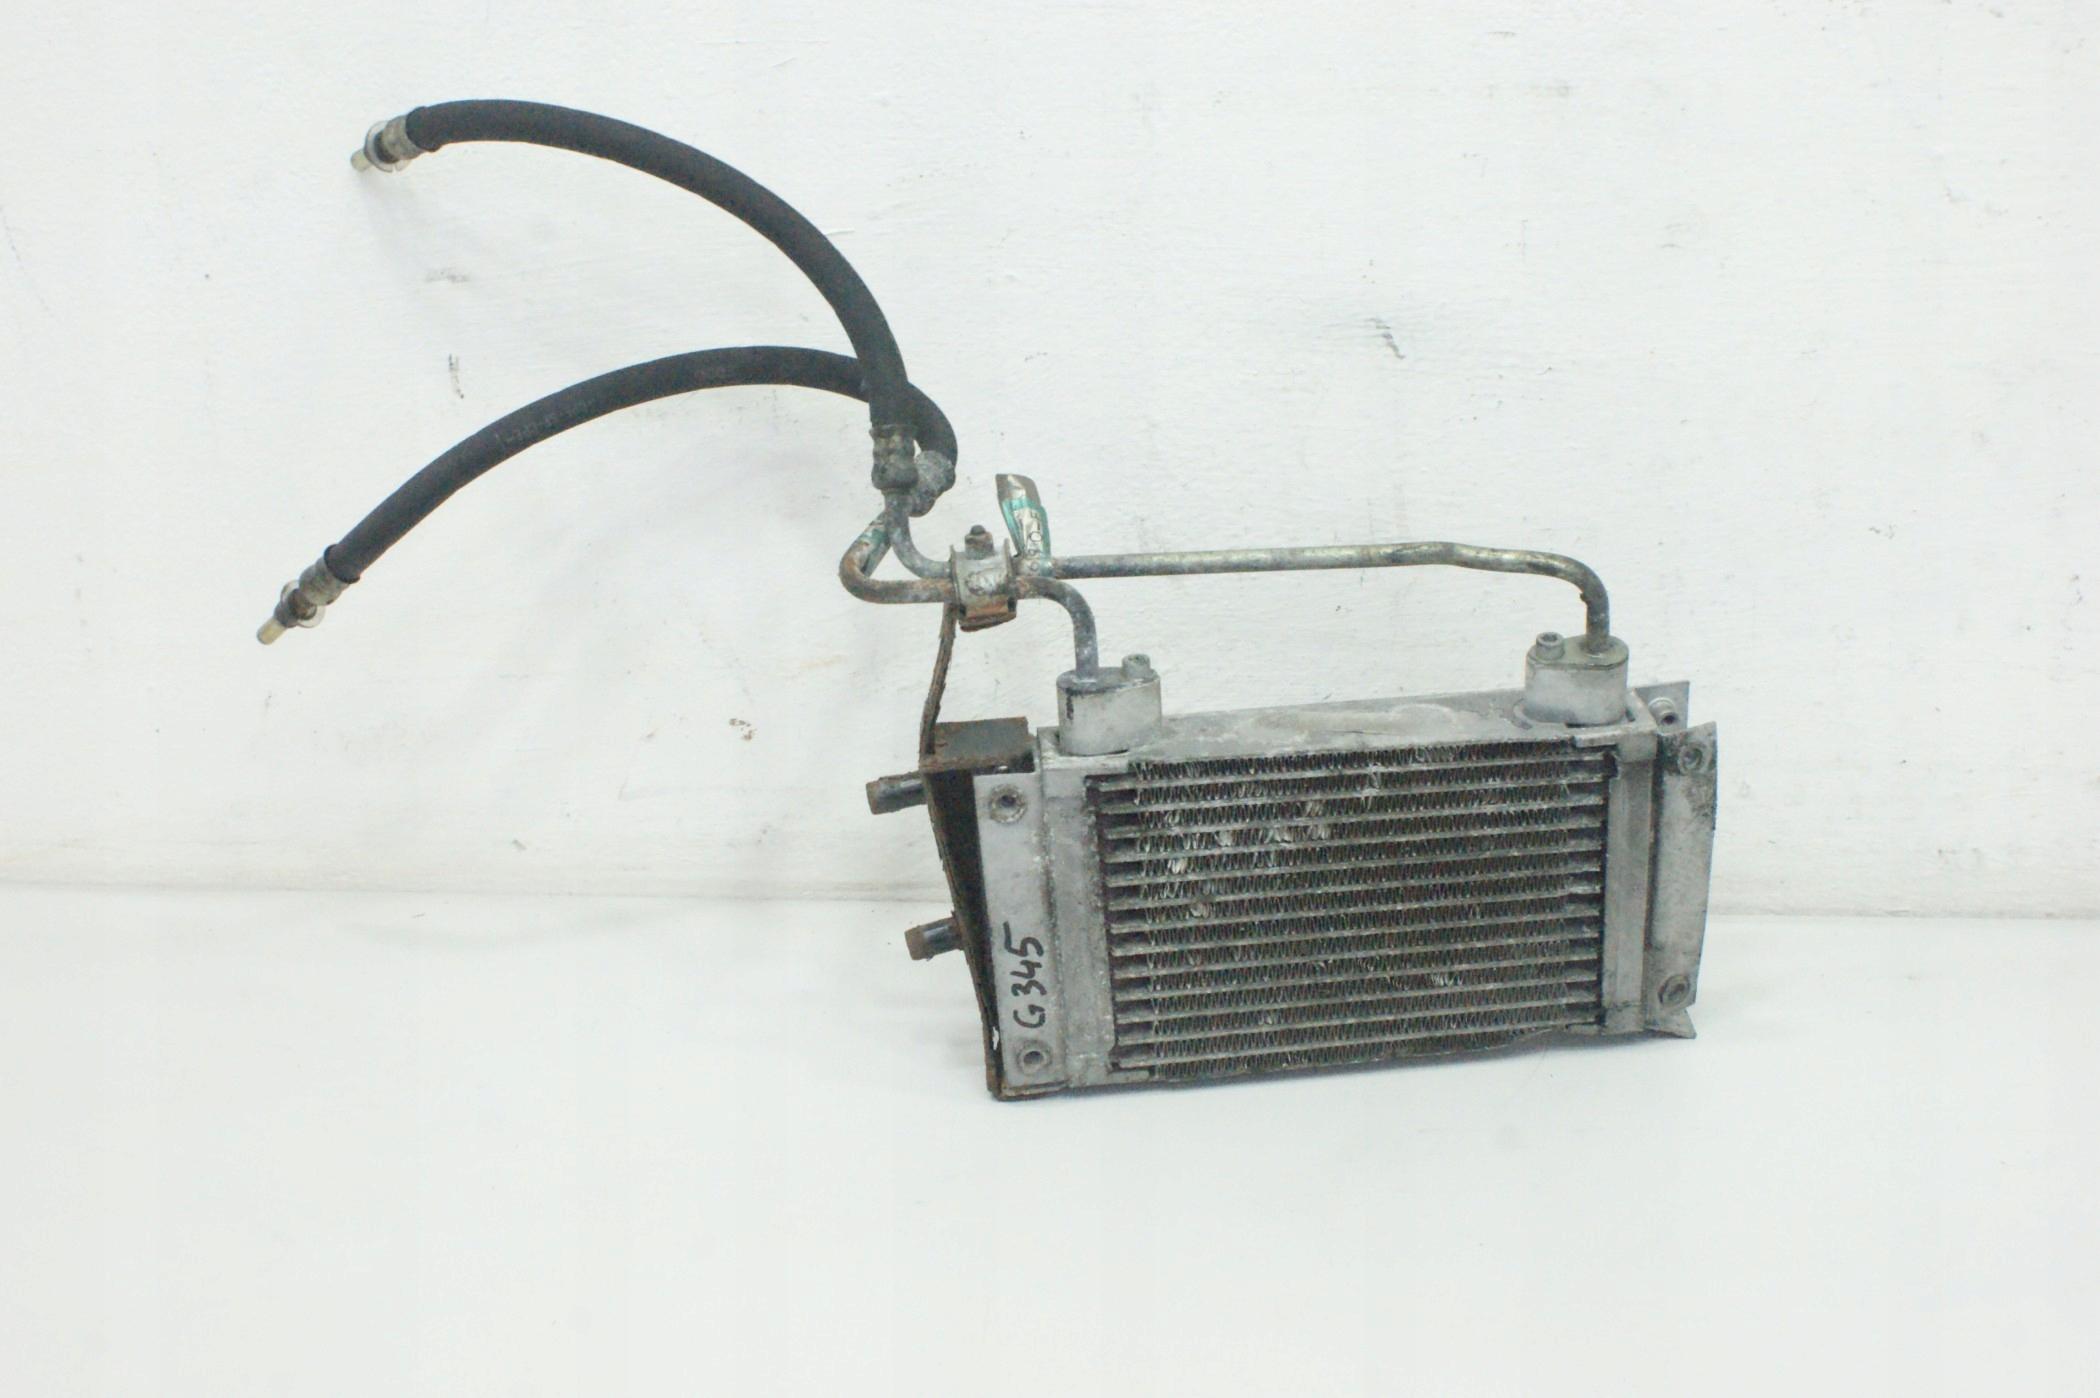 альфа romeo 156 25 радиатор автомобилей коробки передач